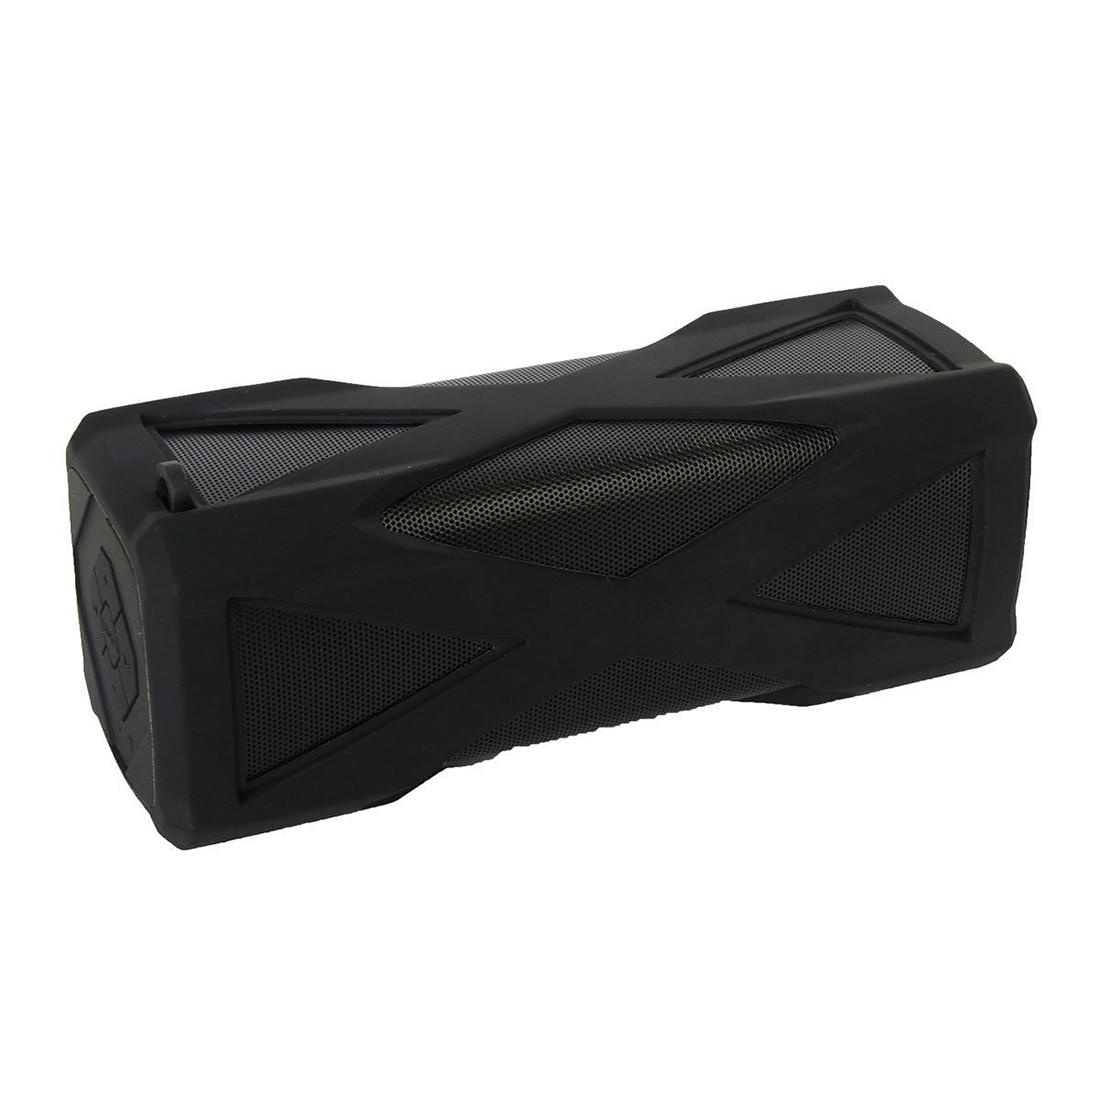 Waterproof, Dustproof, Anti-scratch, Shockproof Wireless Portable Bluetooth Stereo Sport Speaker 4.0 Built-in Mic Playing Hours